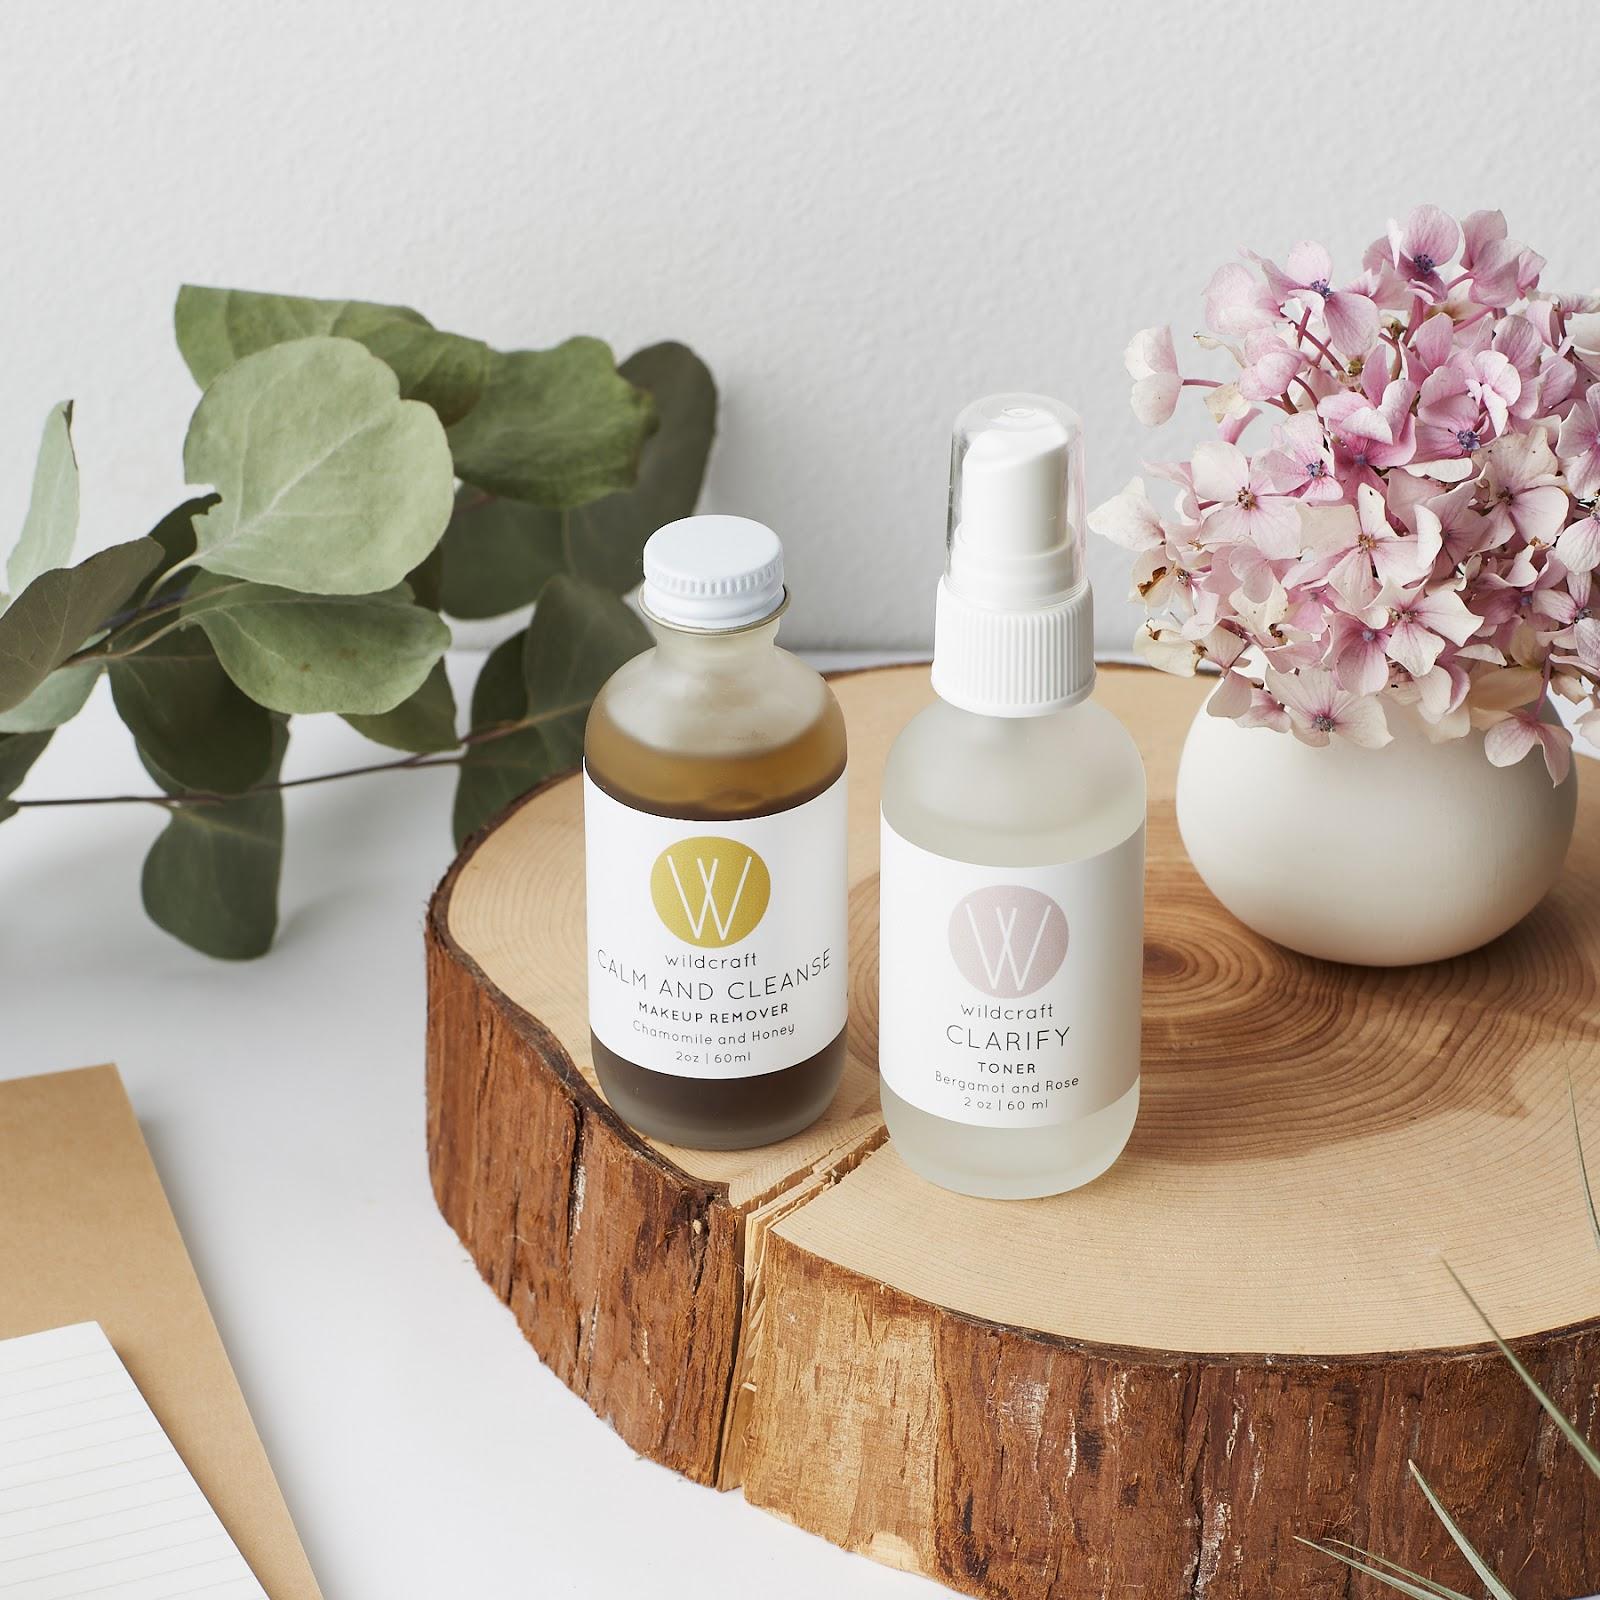 Wildcraft Bergamot Rose Toner + Chamomile Honey Makeup Remover Review natural organic skincare brand for acne prone skin remedy oily hellolindasau